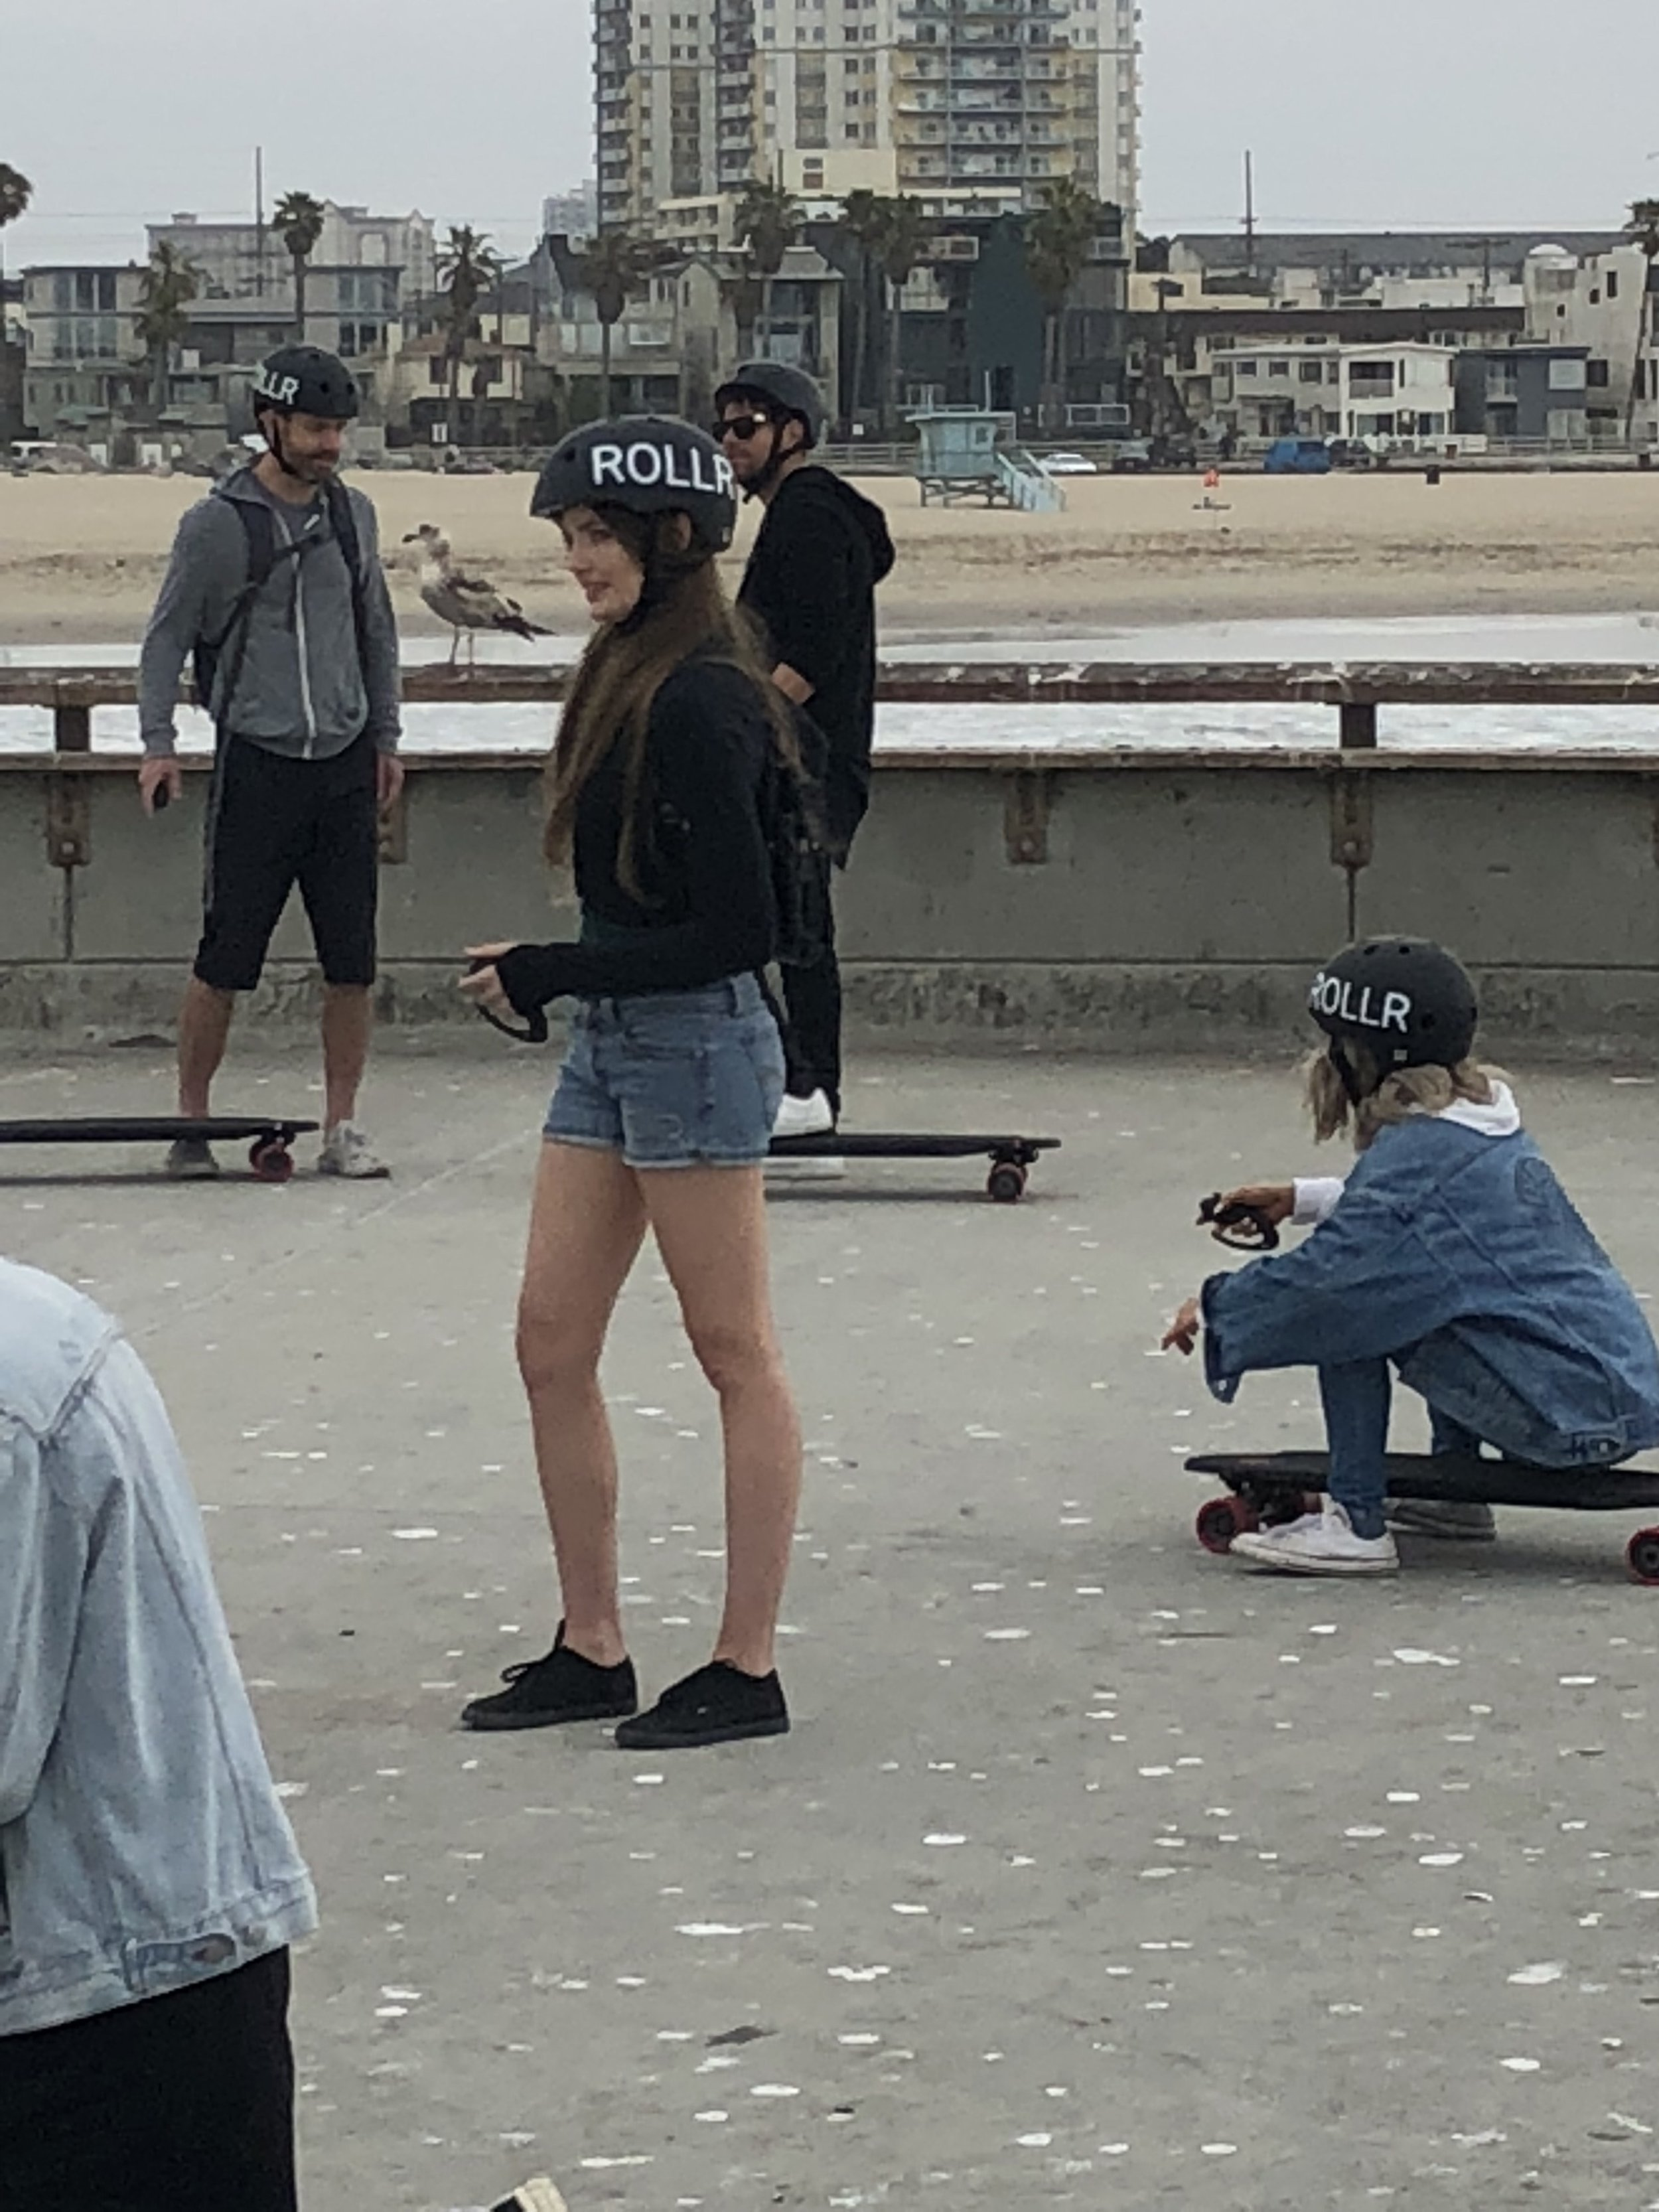 venice-beach-pier-tour-rollr-app.jpg